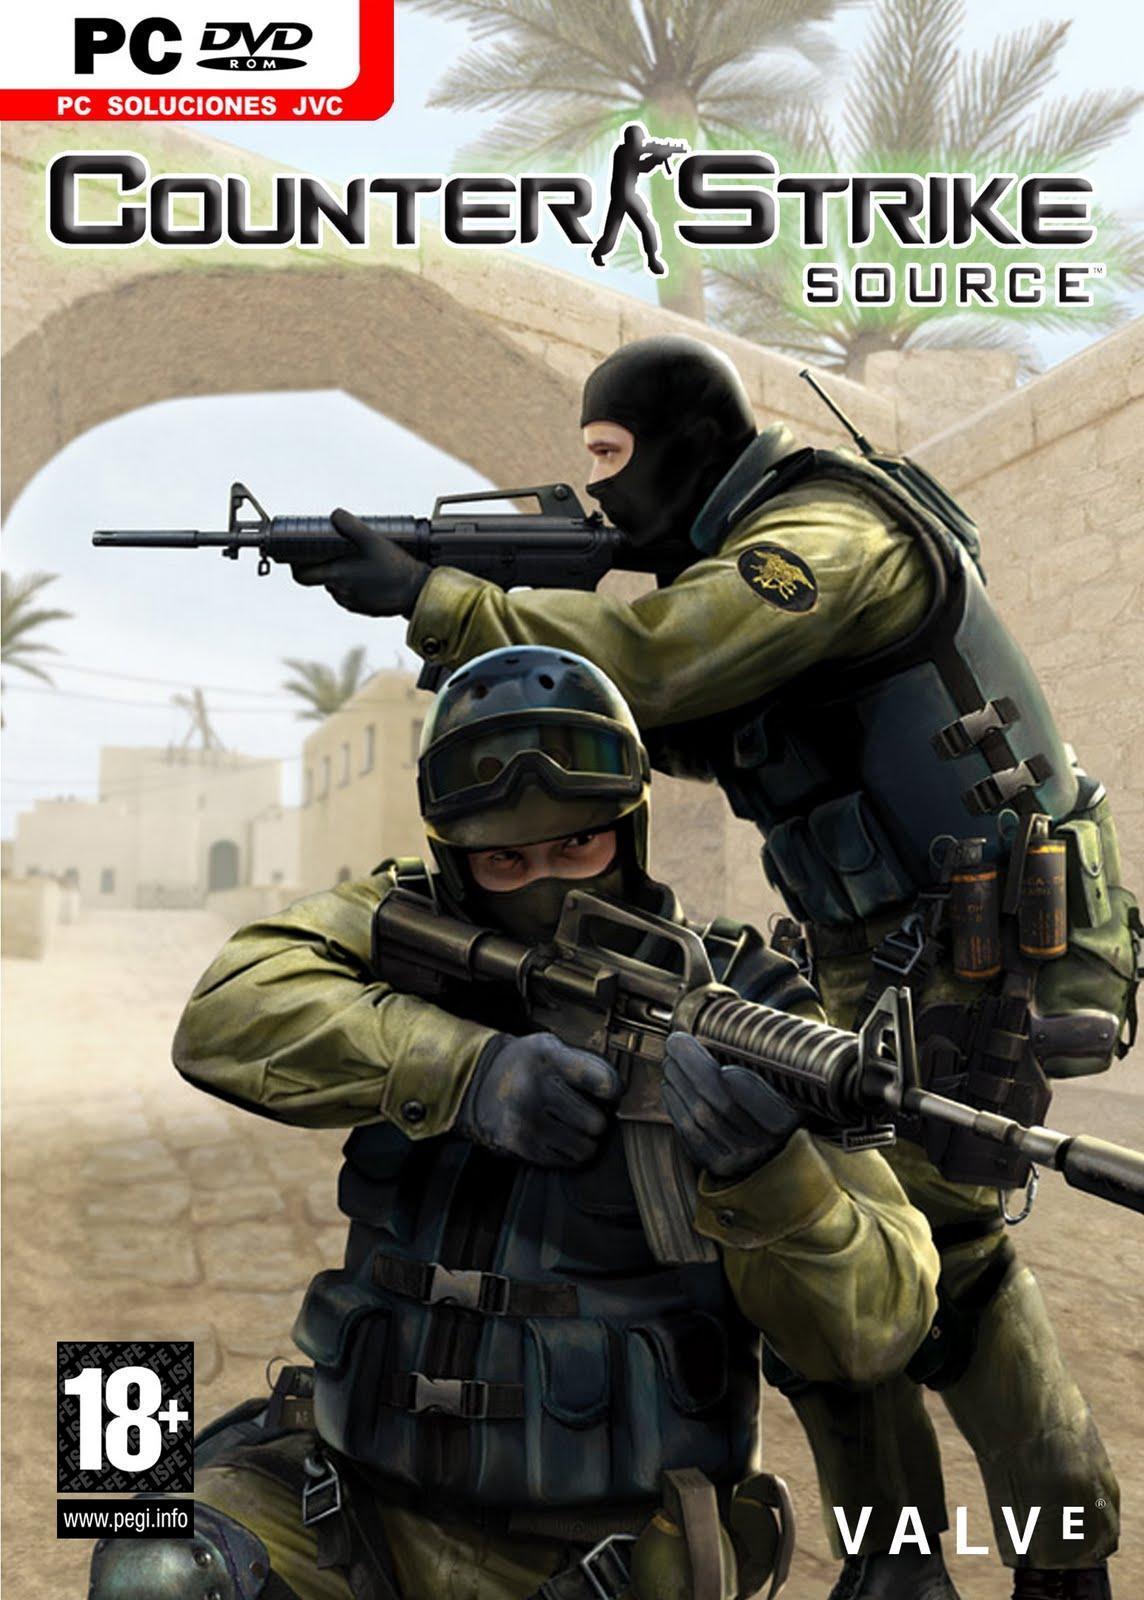 Counter Strike ((تکی4000تومان عمده2200تومان(هر5عدد) ))